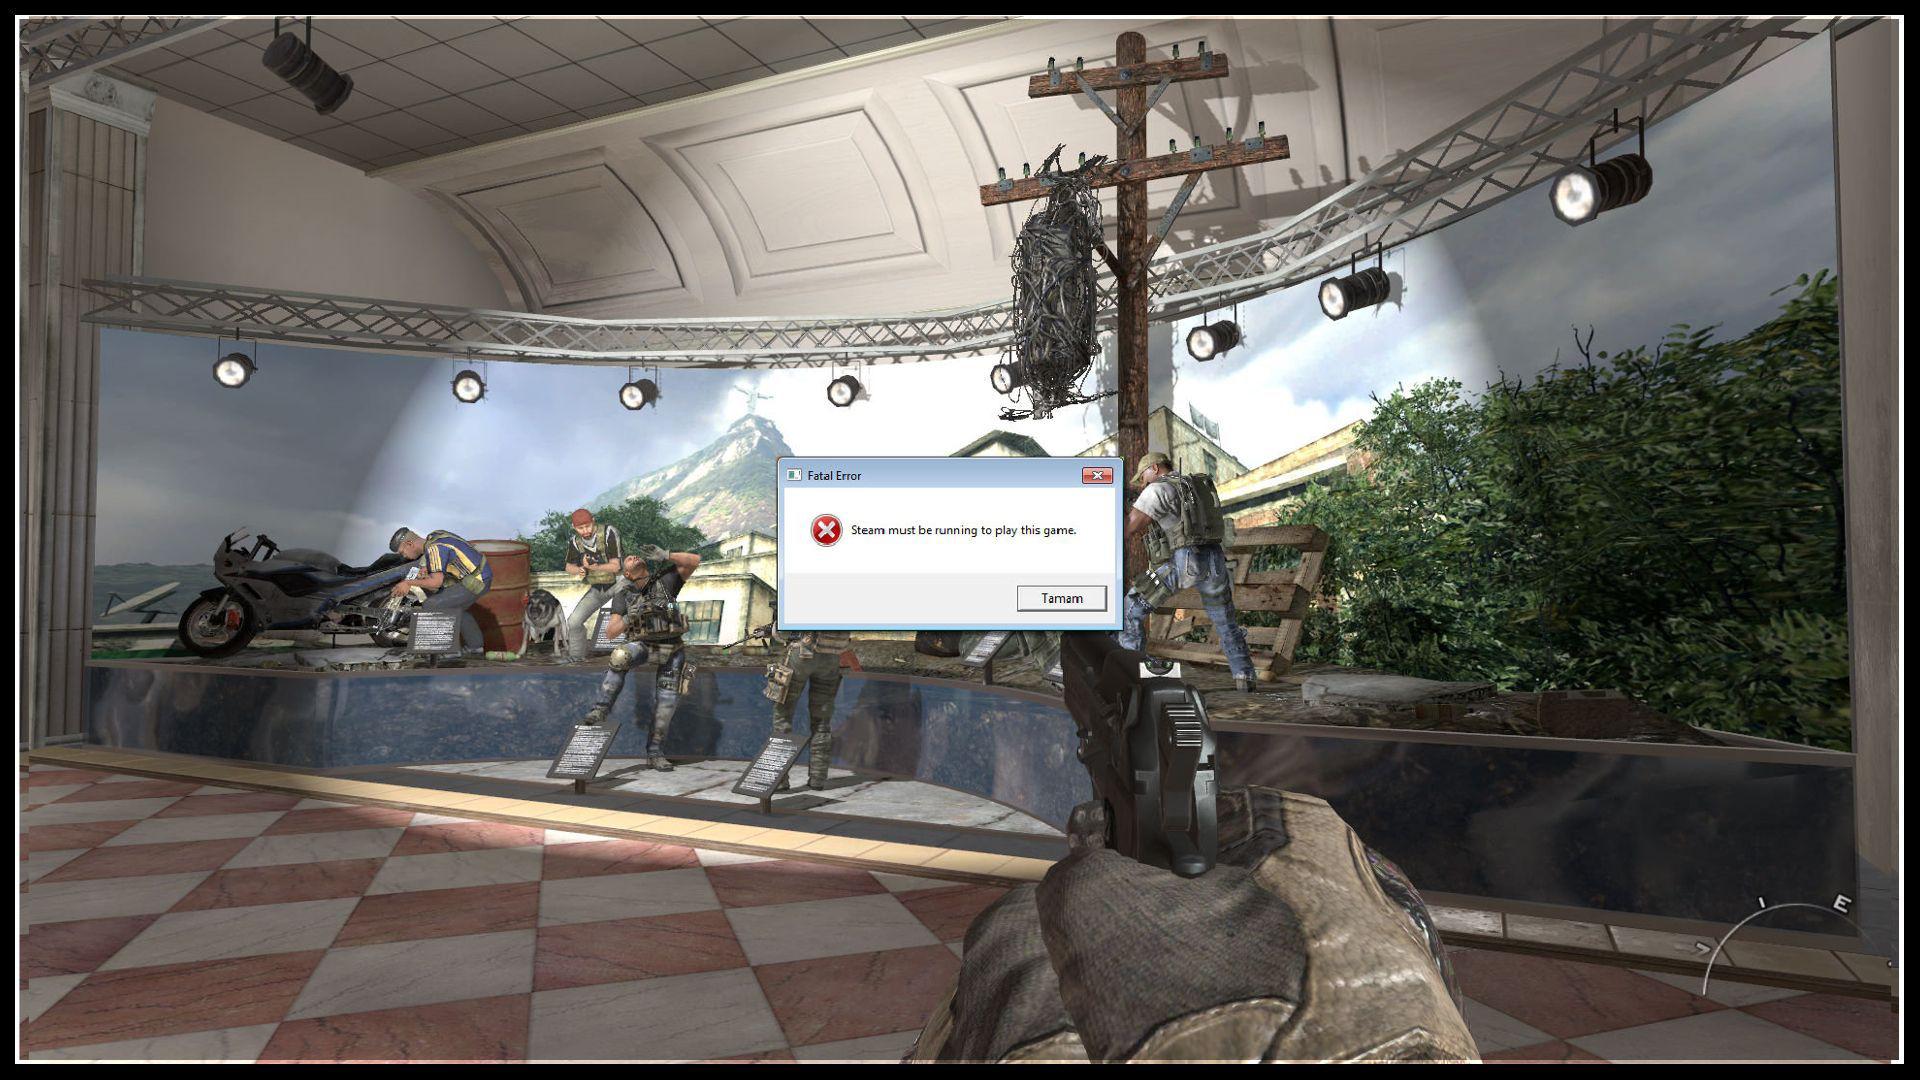 Modern Warfare 2 Steam Must Be Running to Play This Game Error